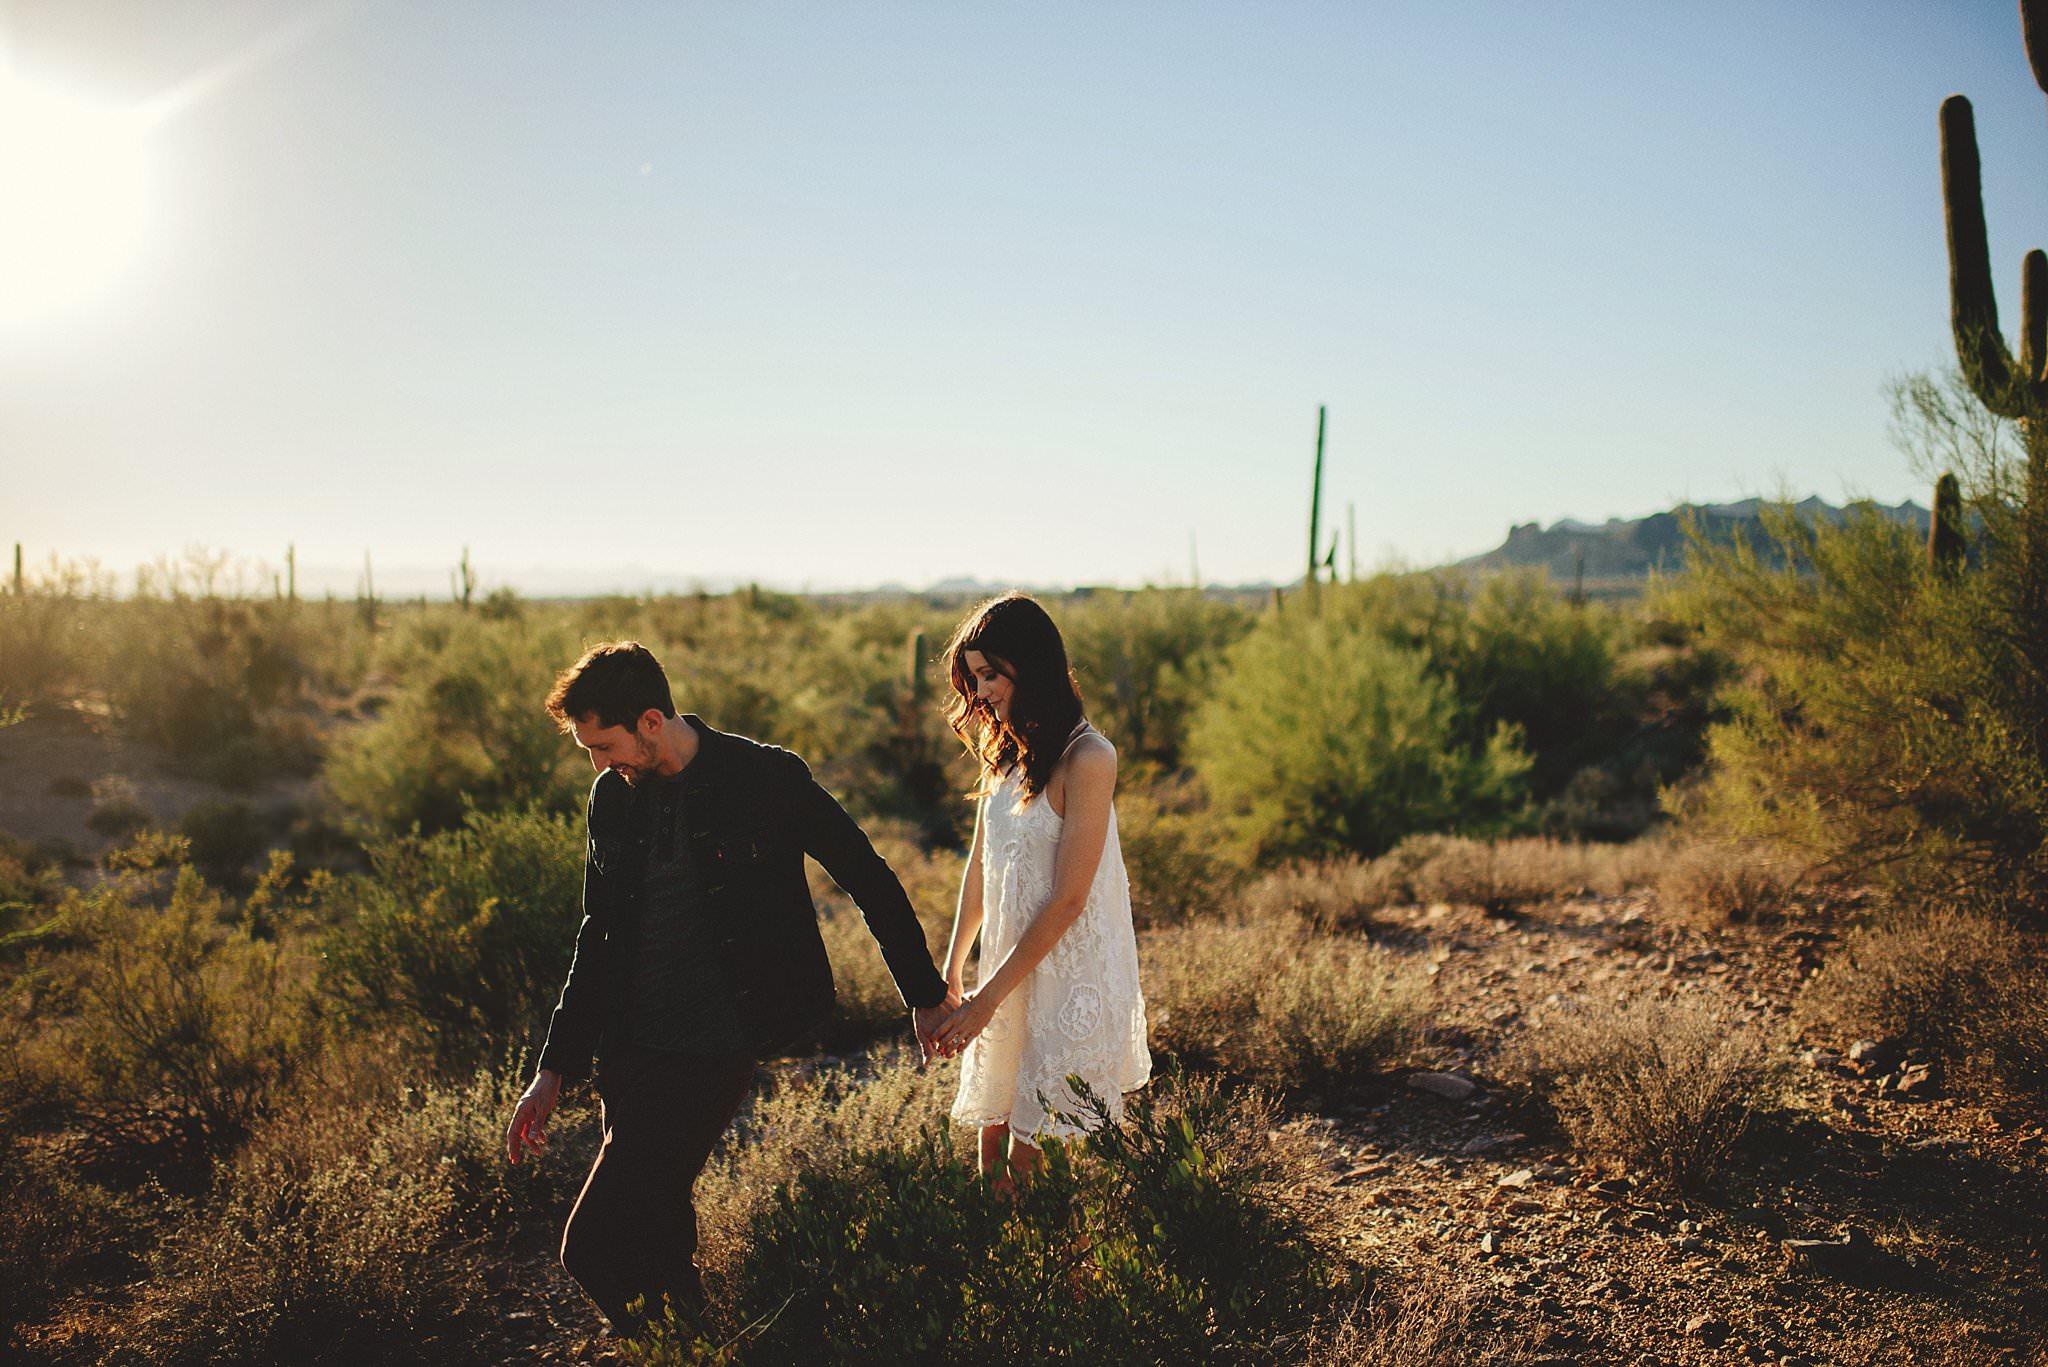 superstition-mountains-desert-engagement-photos-0014.jpg